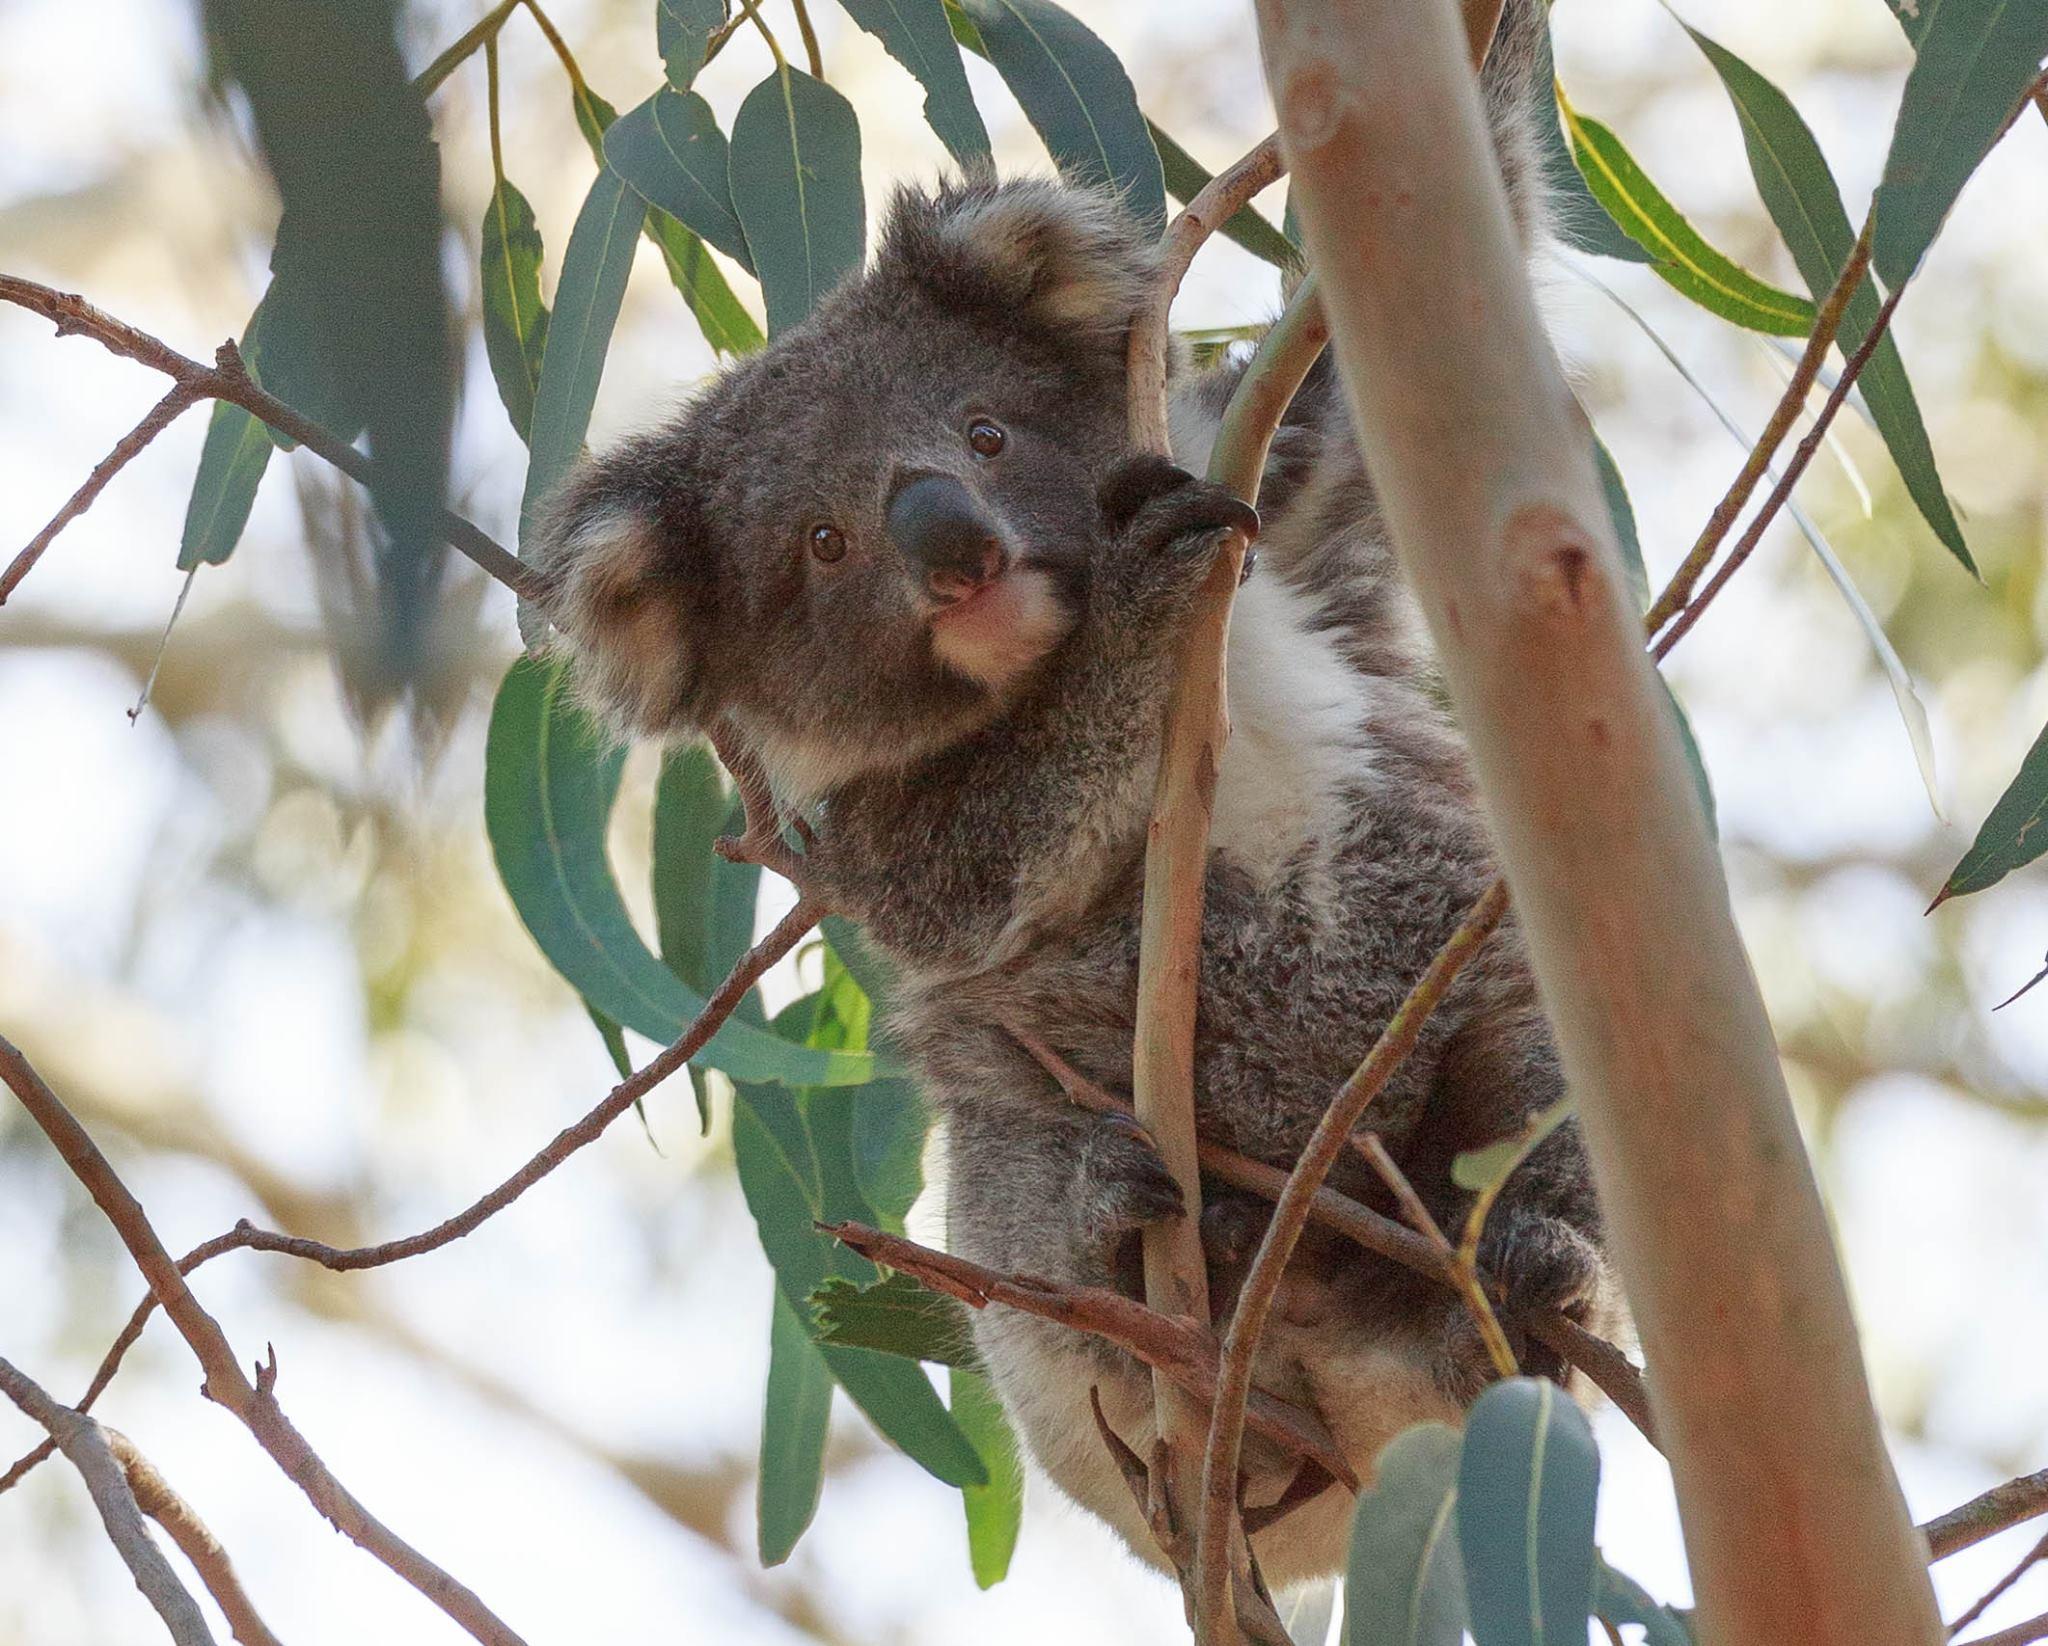 Koalas in Harriet River, Where to see wild koalas in Australia